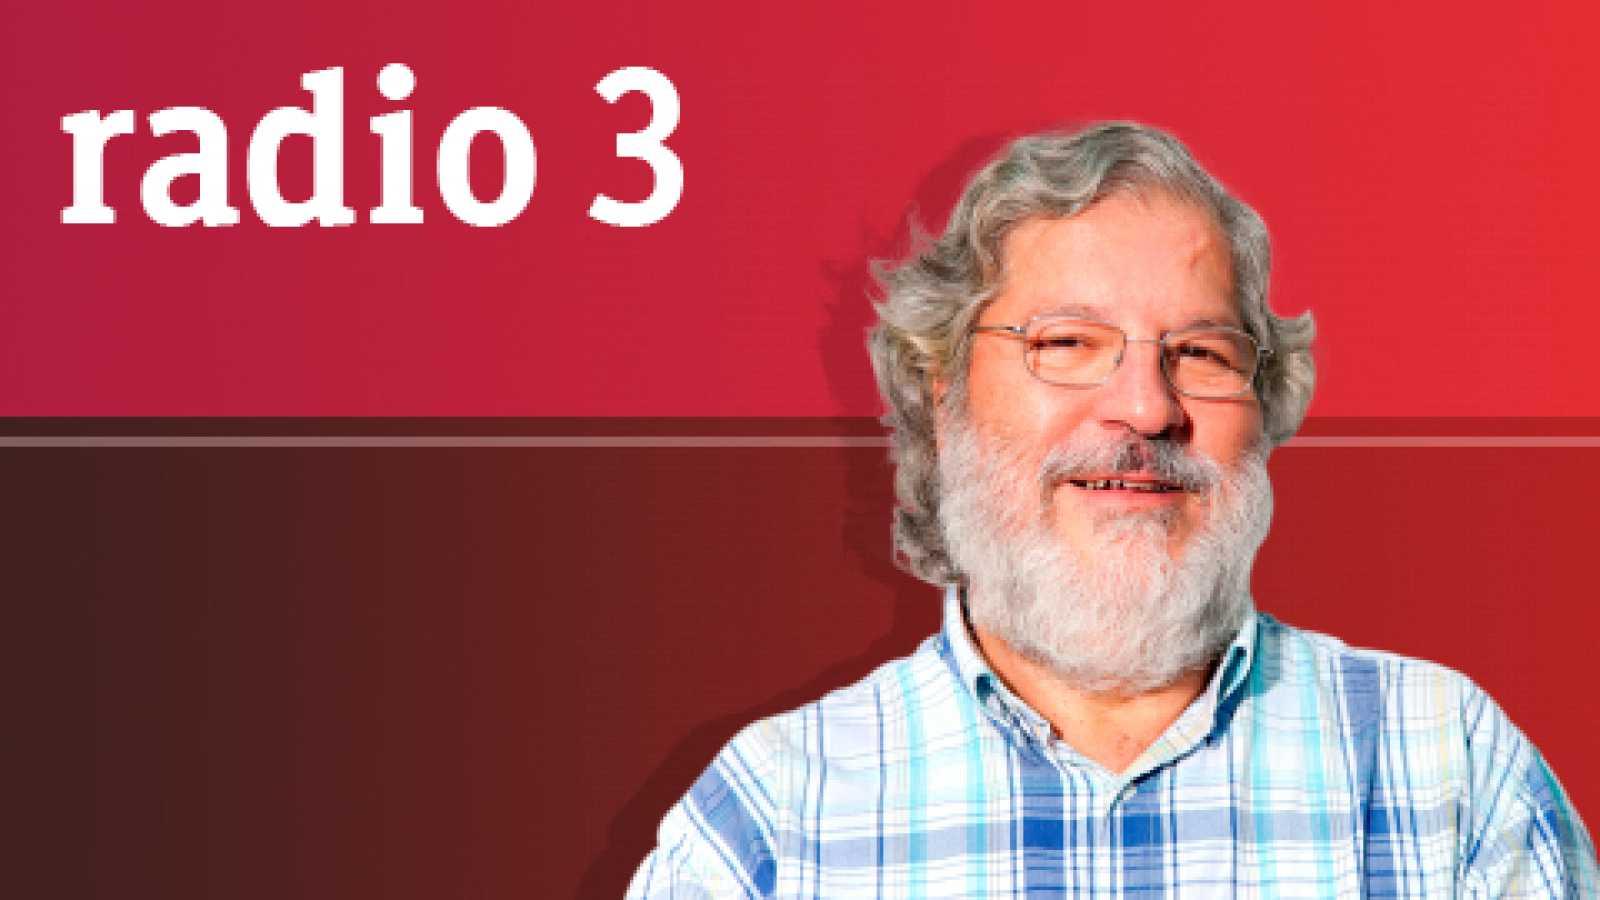 Discópolis - 10.804: Sesiones tesoro RNE 10: Micky - 26/12/19 - escuchar ahora